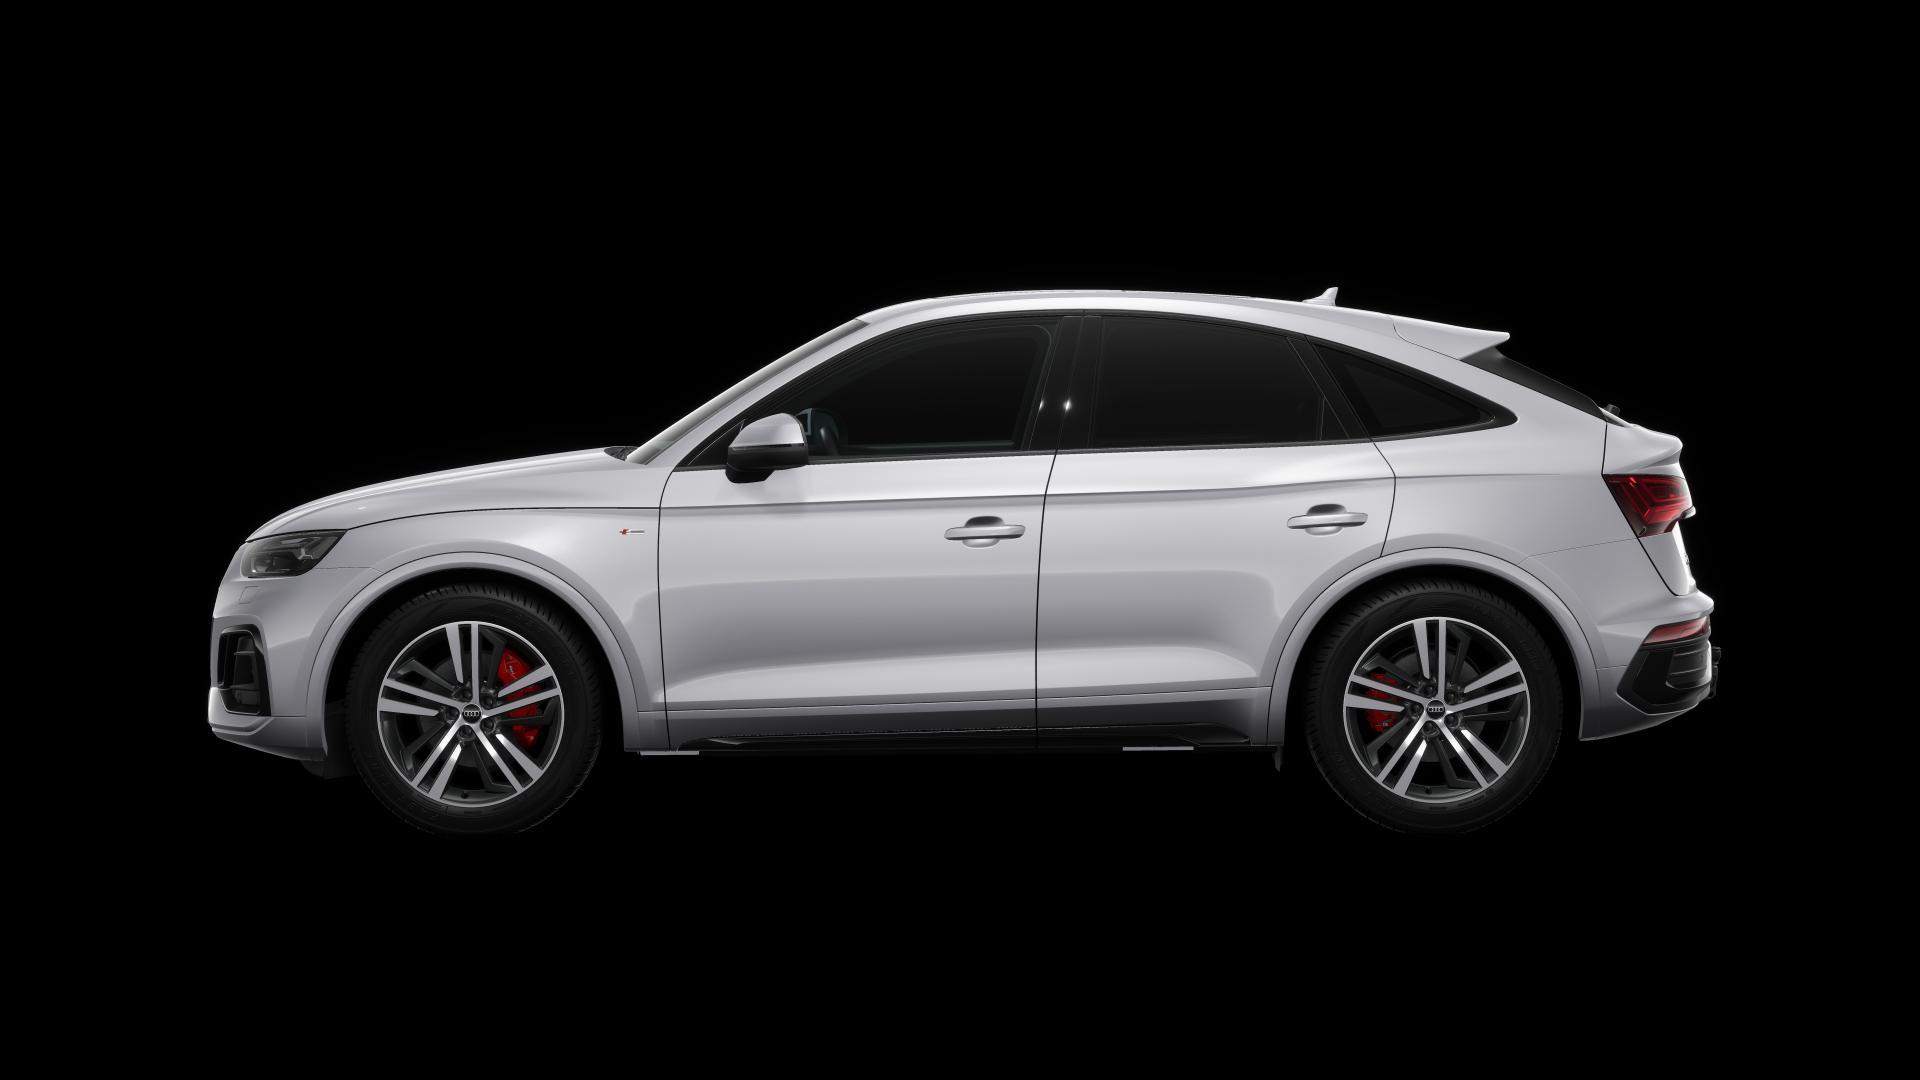 Audi Q5 Sportback Business Edition S line 40 TDI quattro 150(204) kW(pk) S tronic